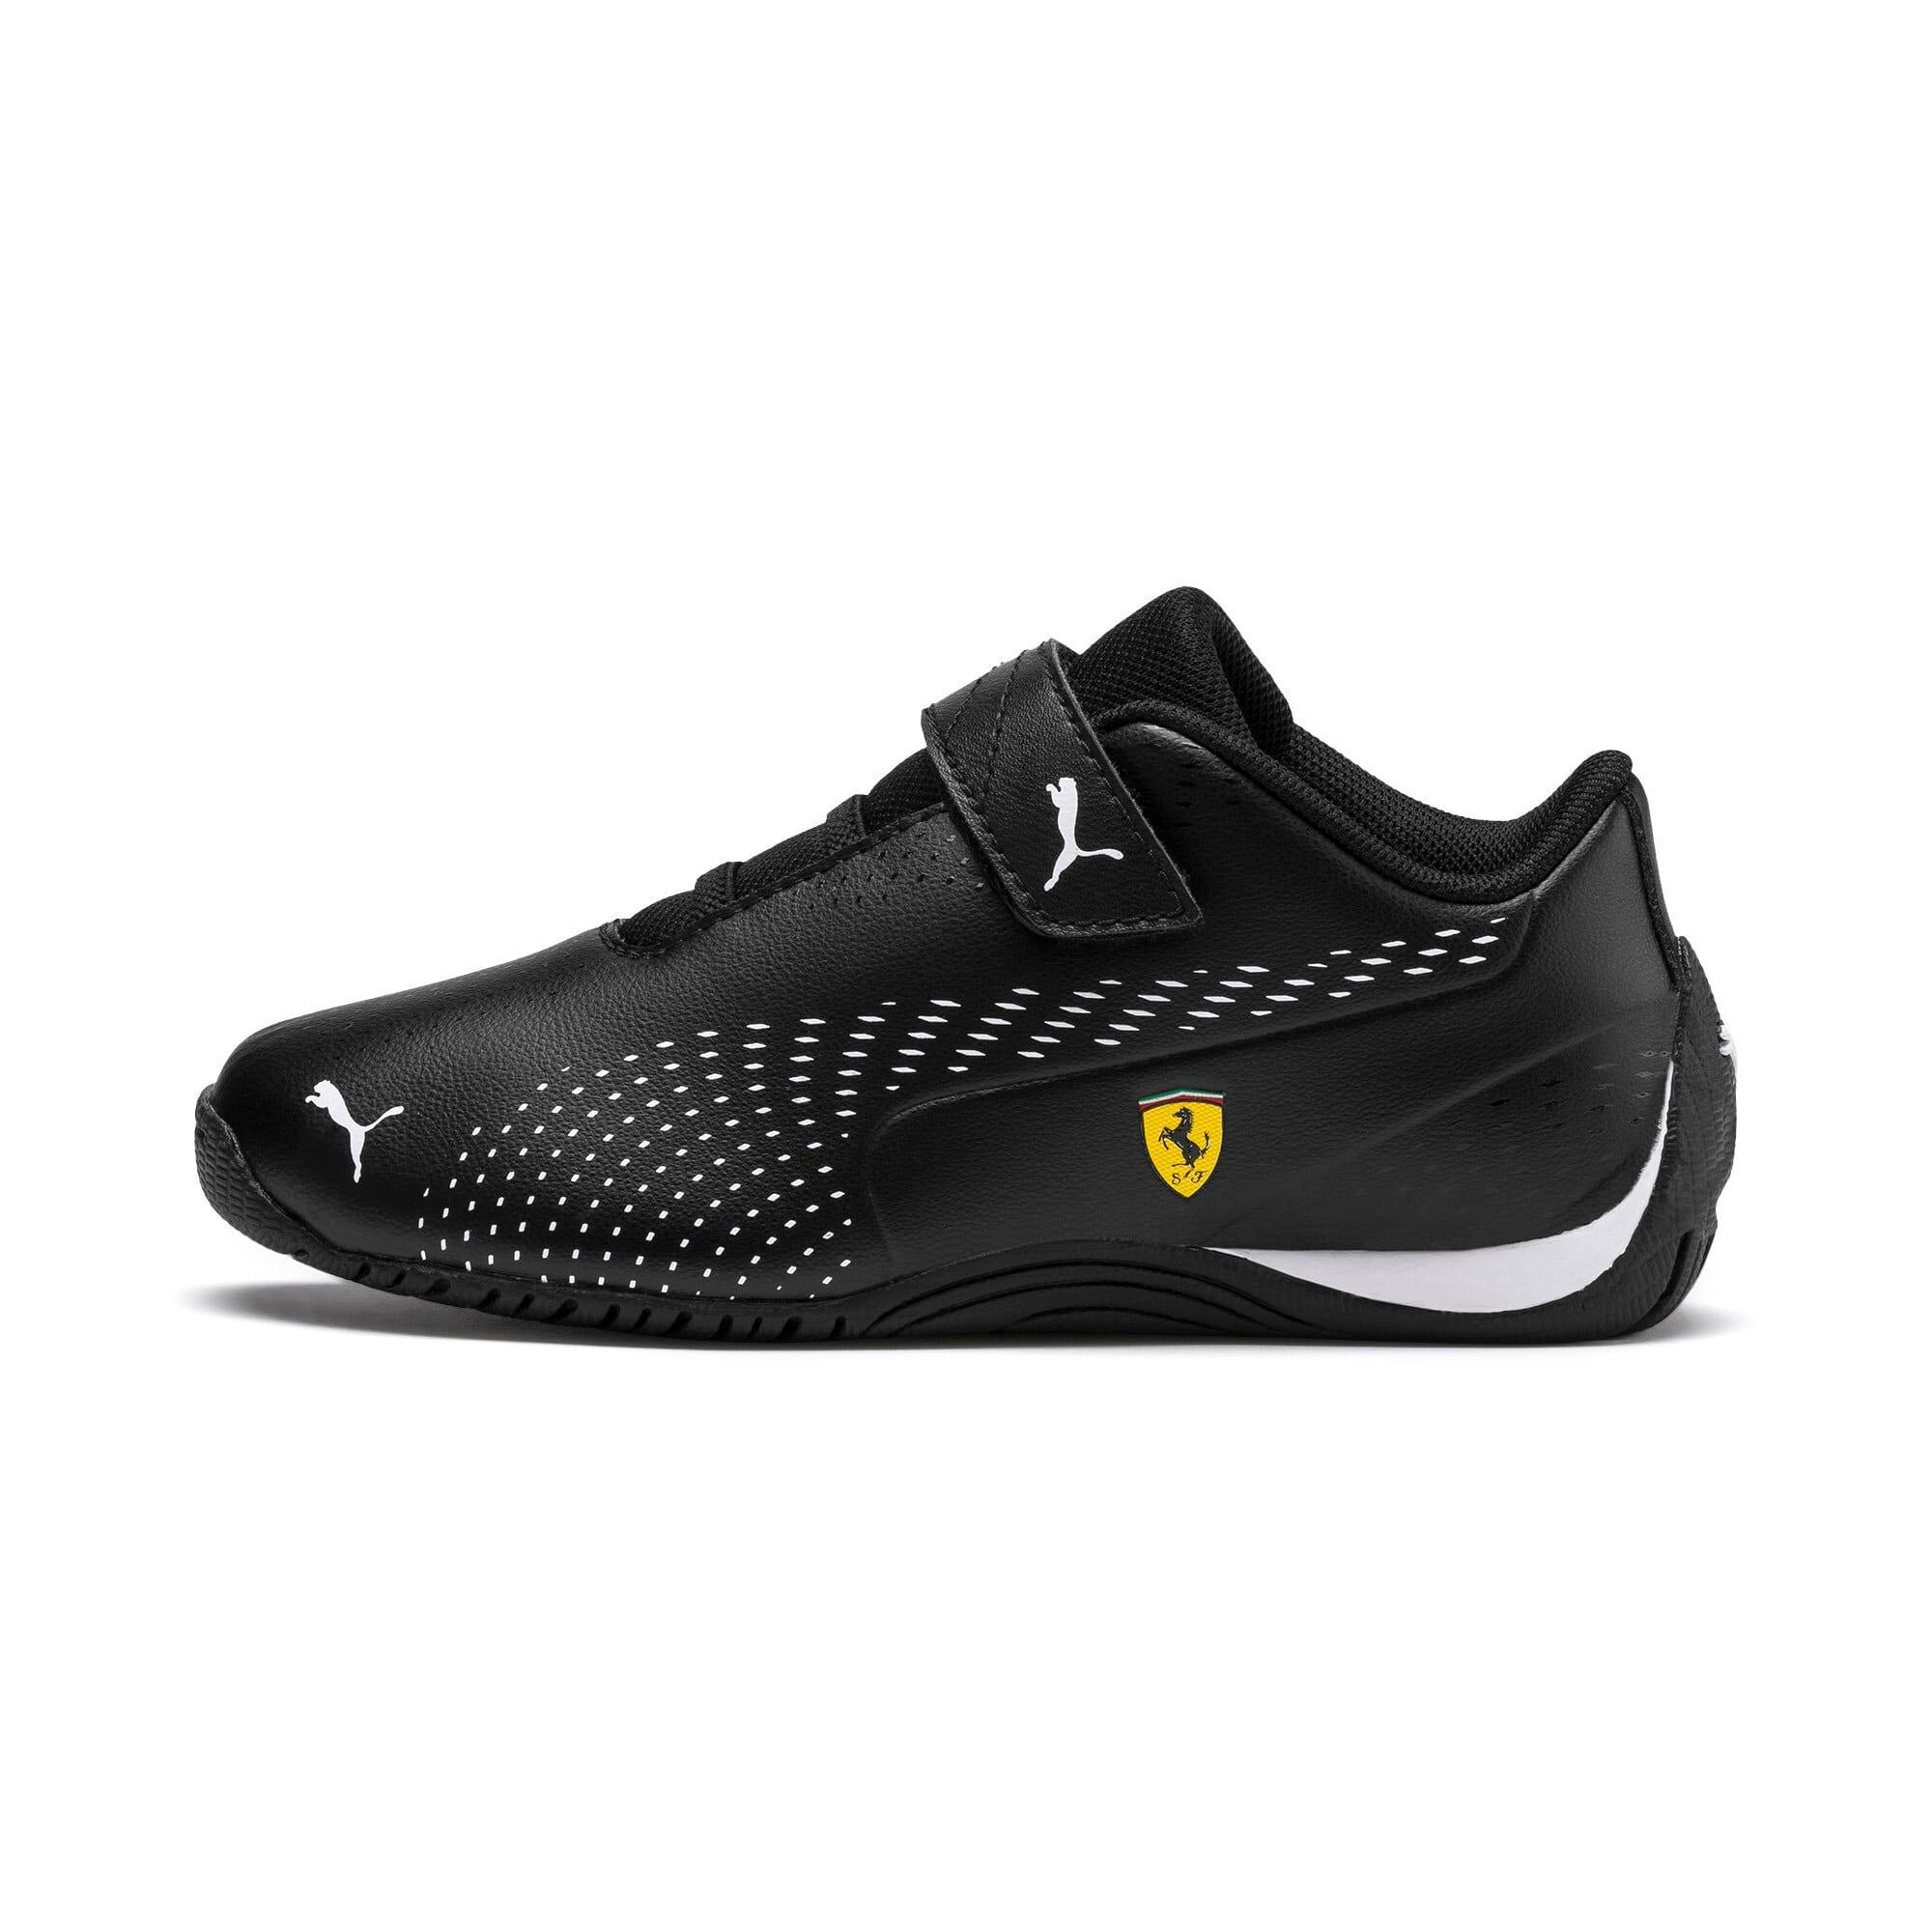 Thumbnail 1 of Ferrari Drift Cat 5 Ultra II V Kids' Trainers, Puma Black-Puma White, medium-IND